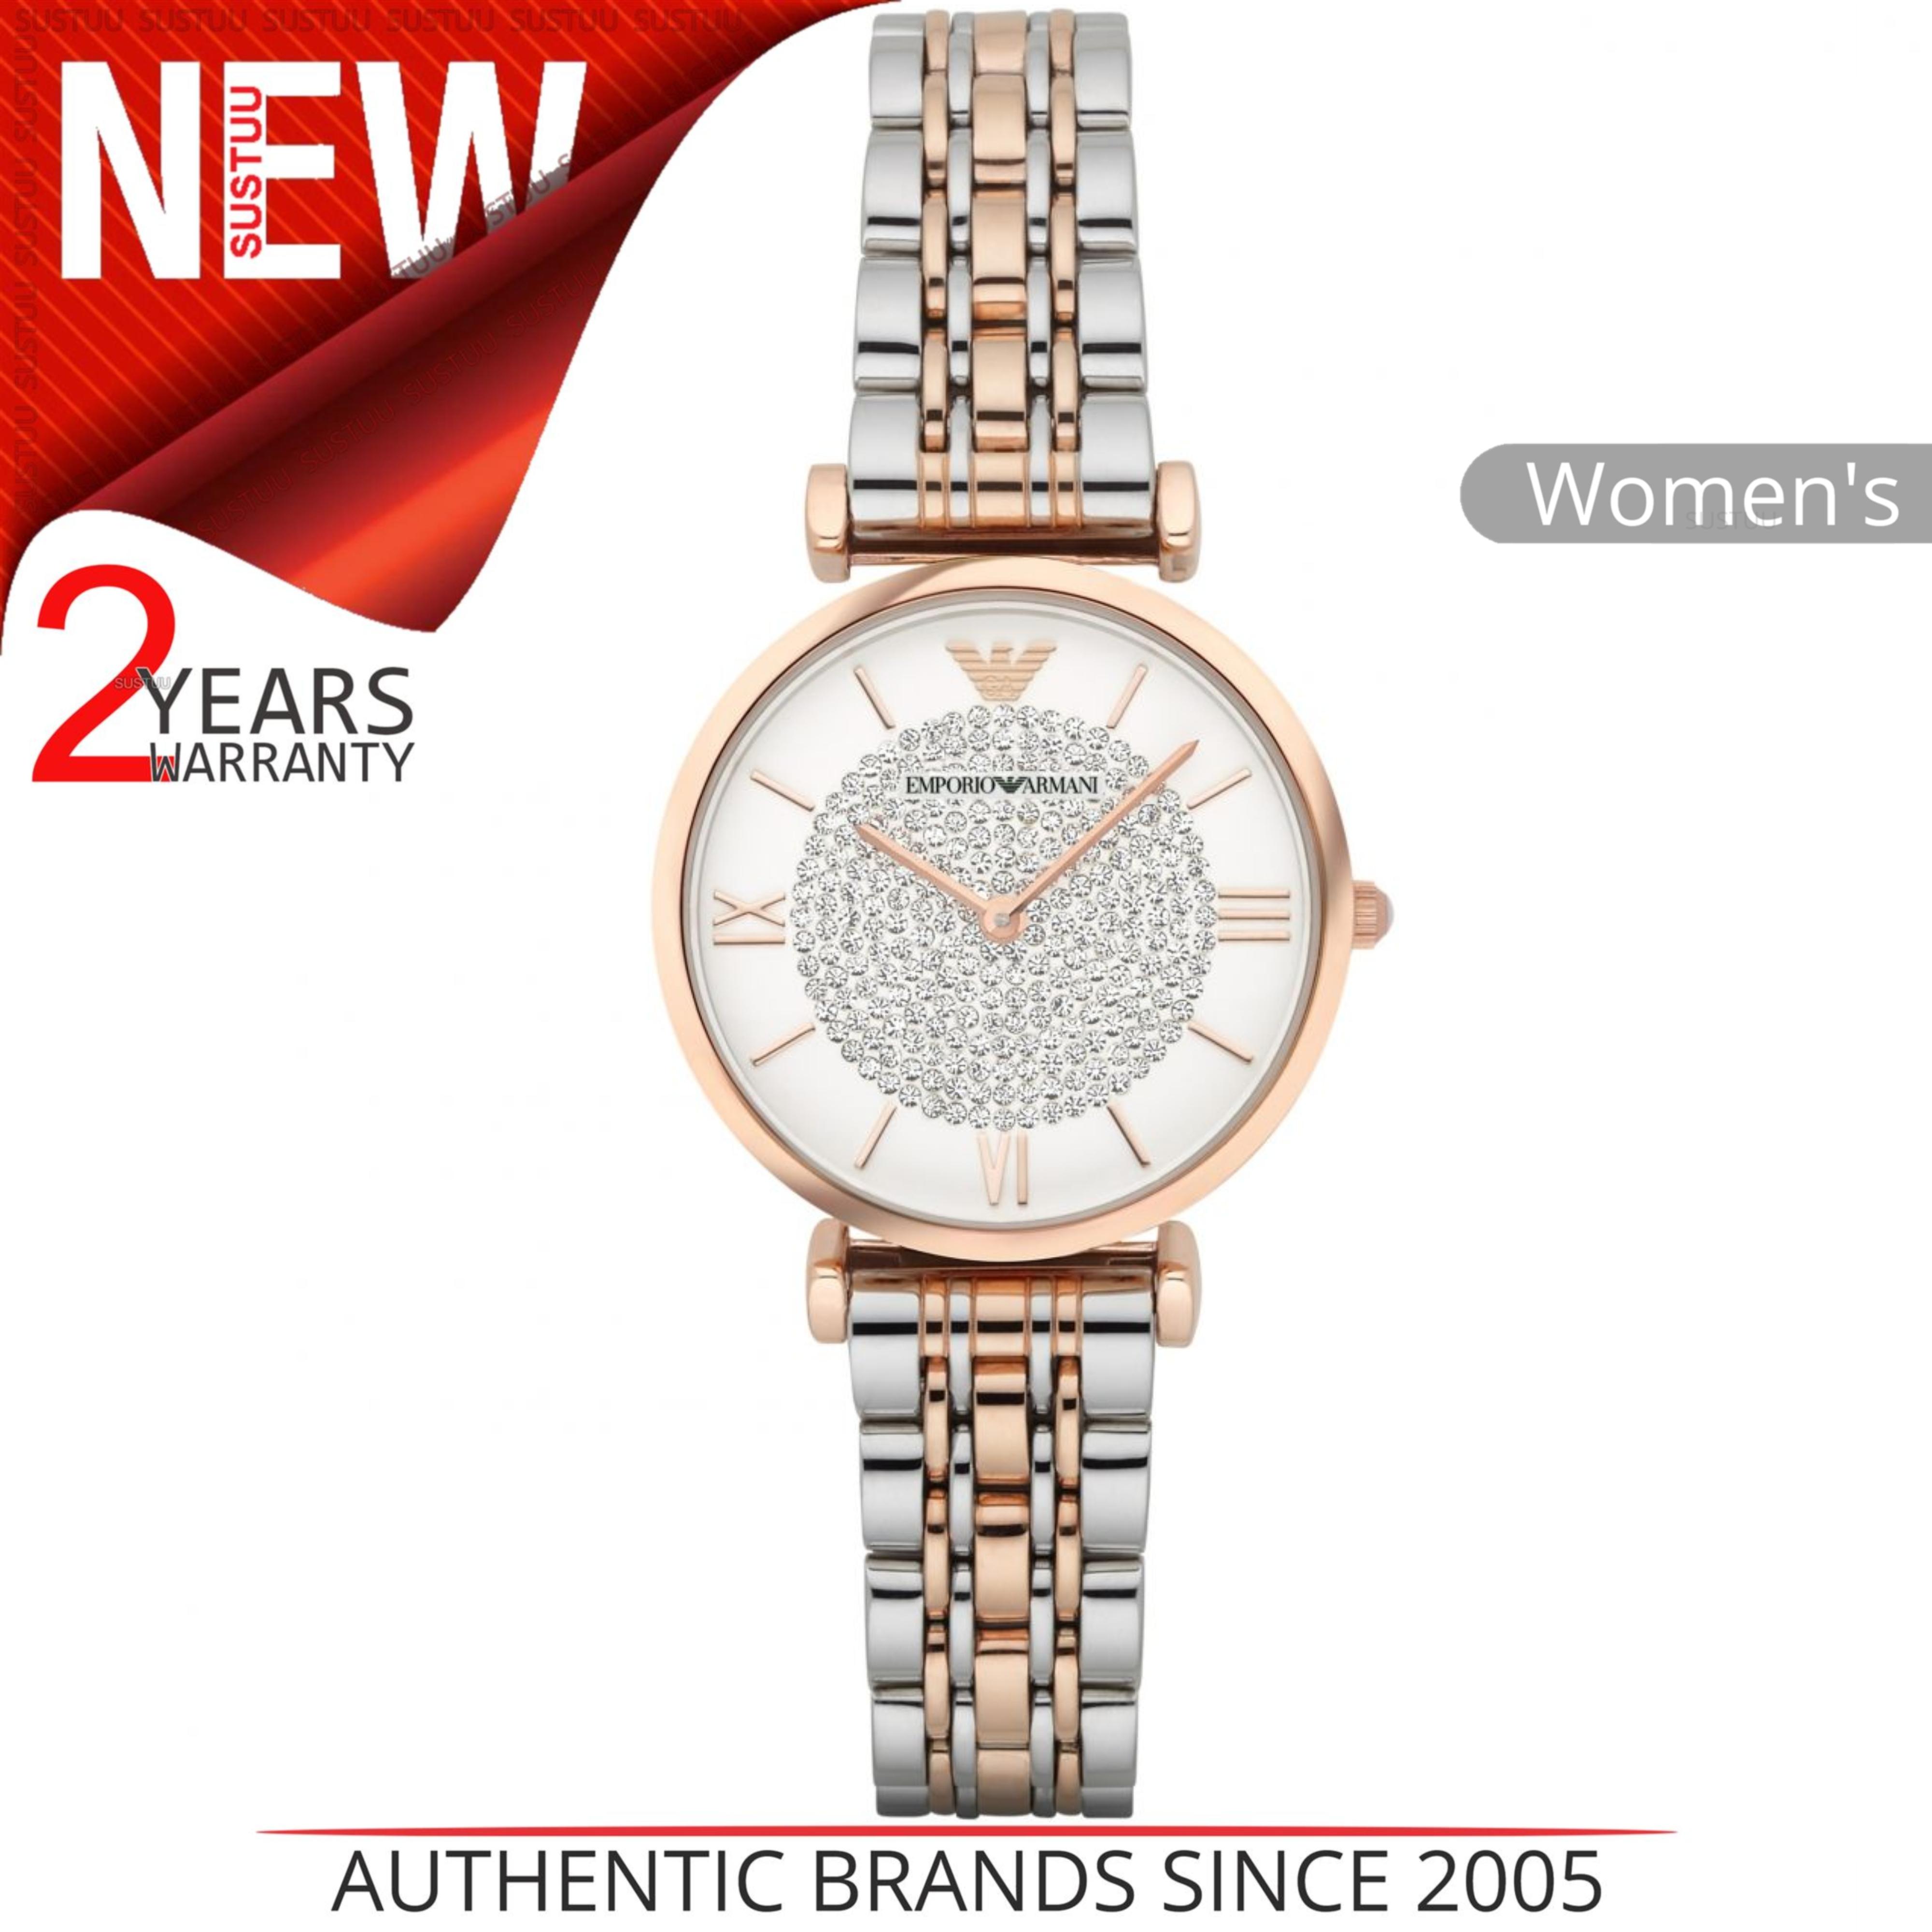 Emporio Armani Women's Watch|White Crystal Pave Dial|Two Tone Bracelet|AR1926